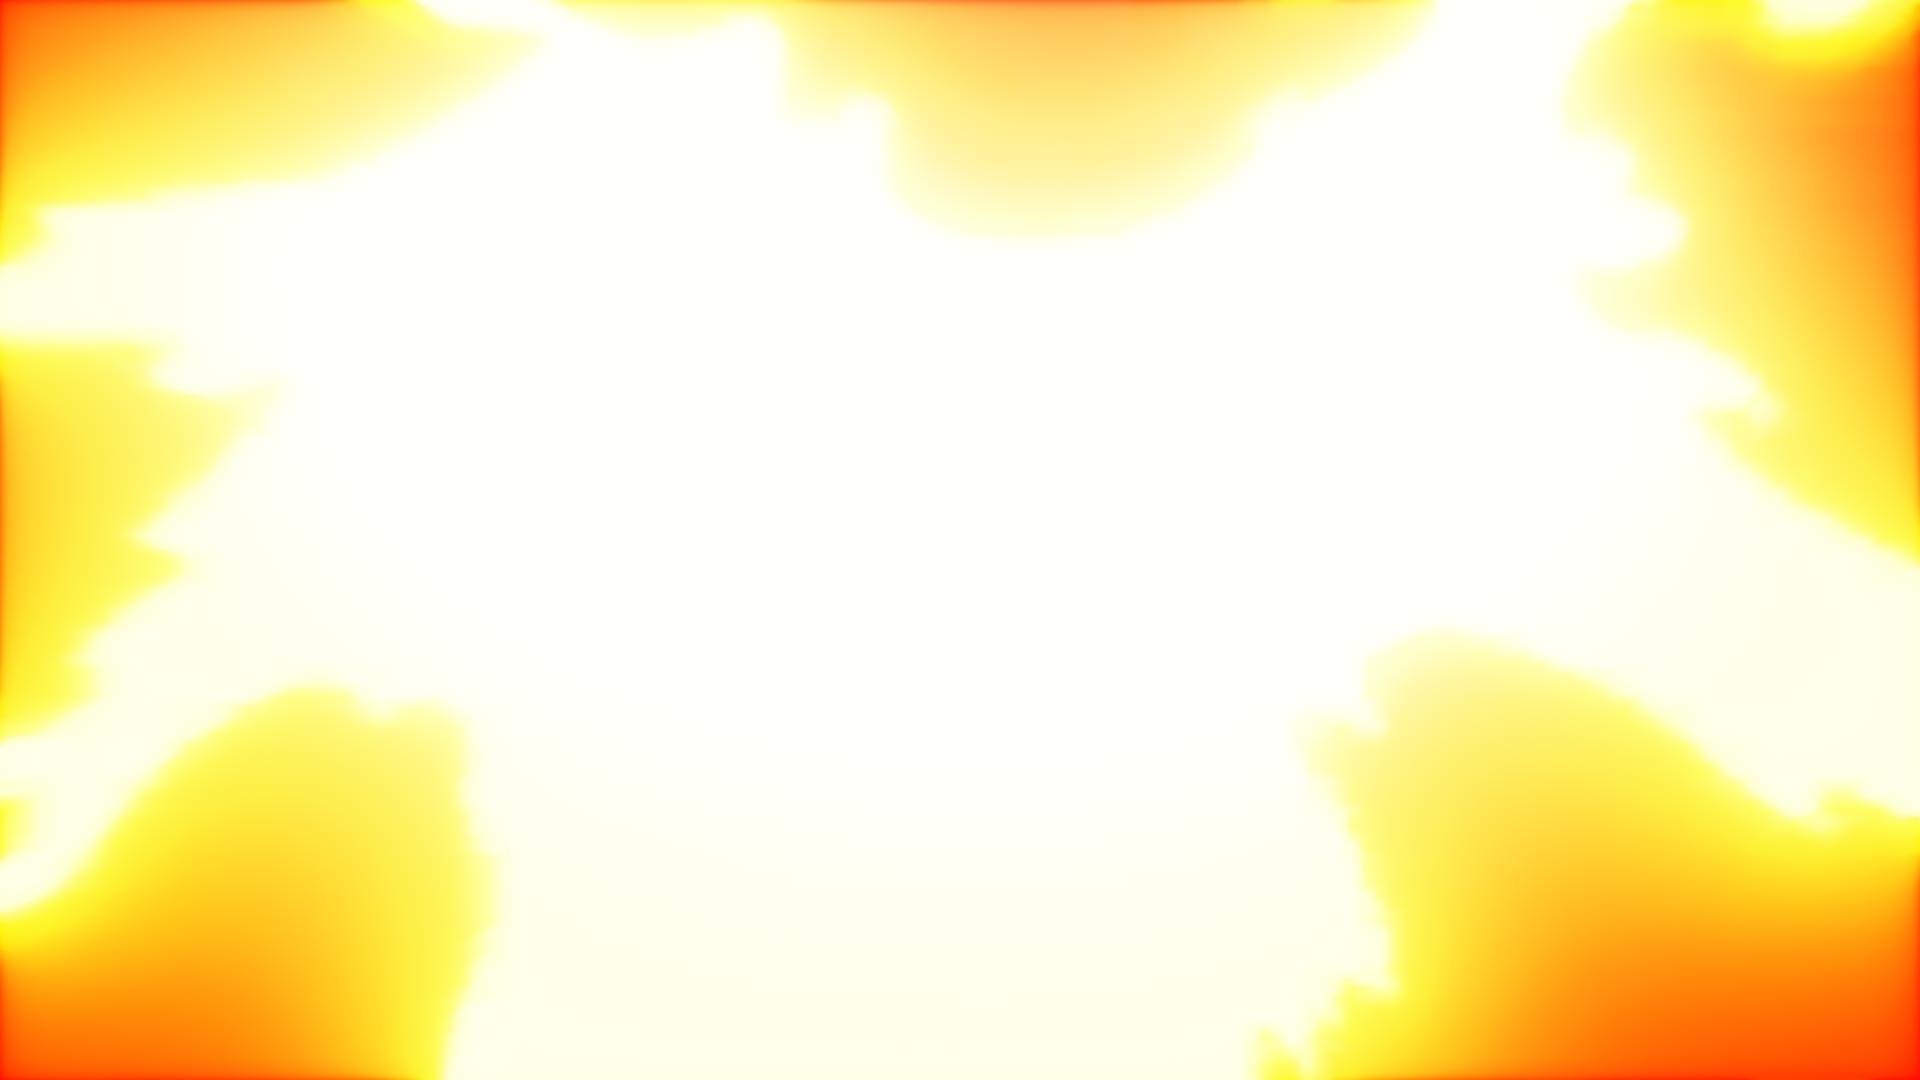 Akuma stage glitch 2 out of 4 image gallery